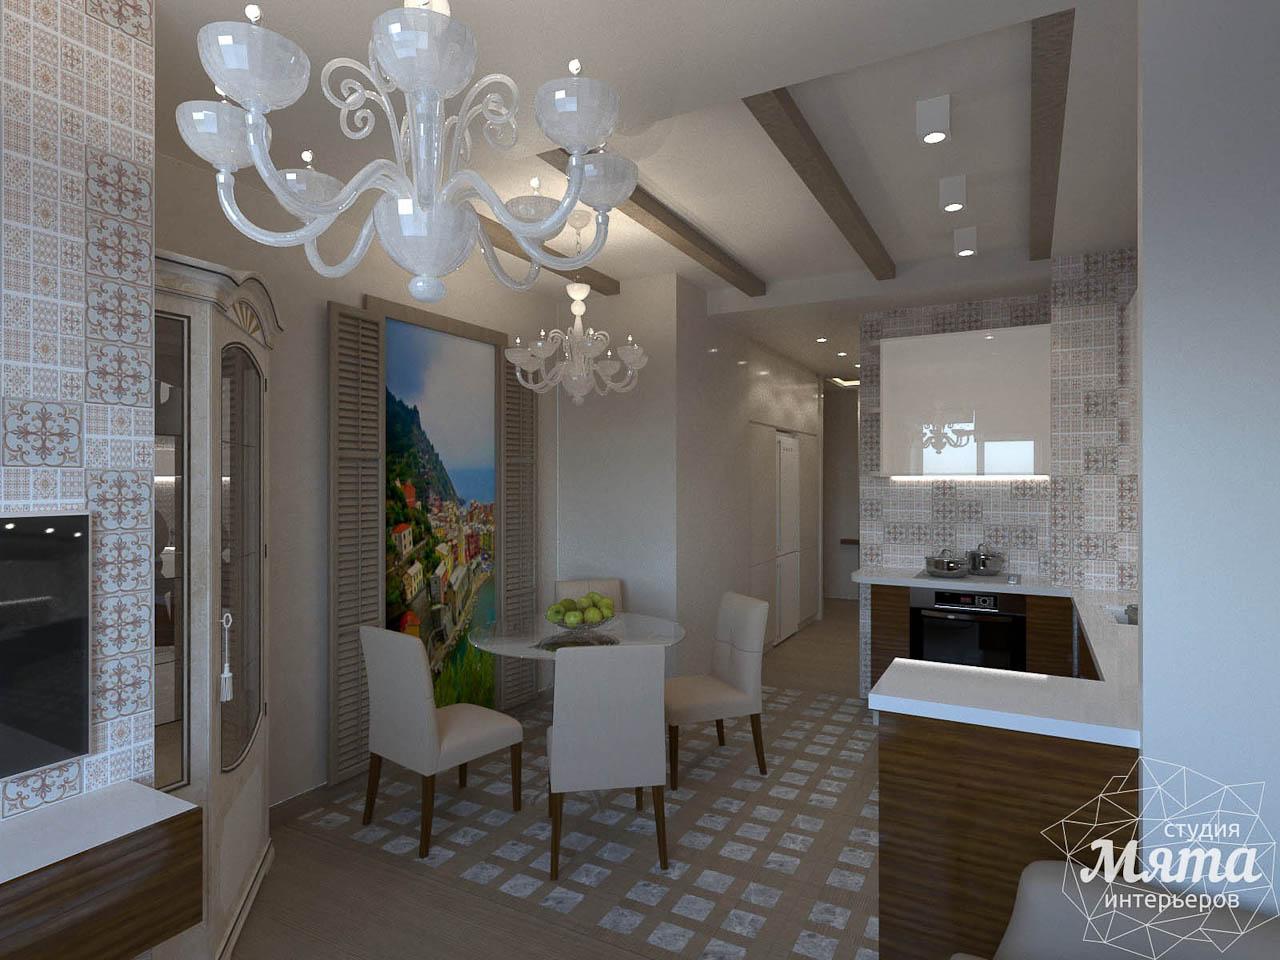 Дизайн интерьера трехкомнатной квартиры по ул. Мельникова 27 img822361370